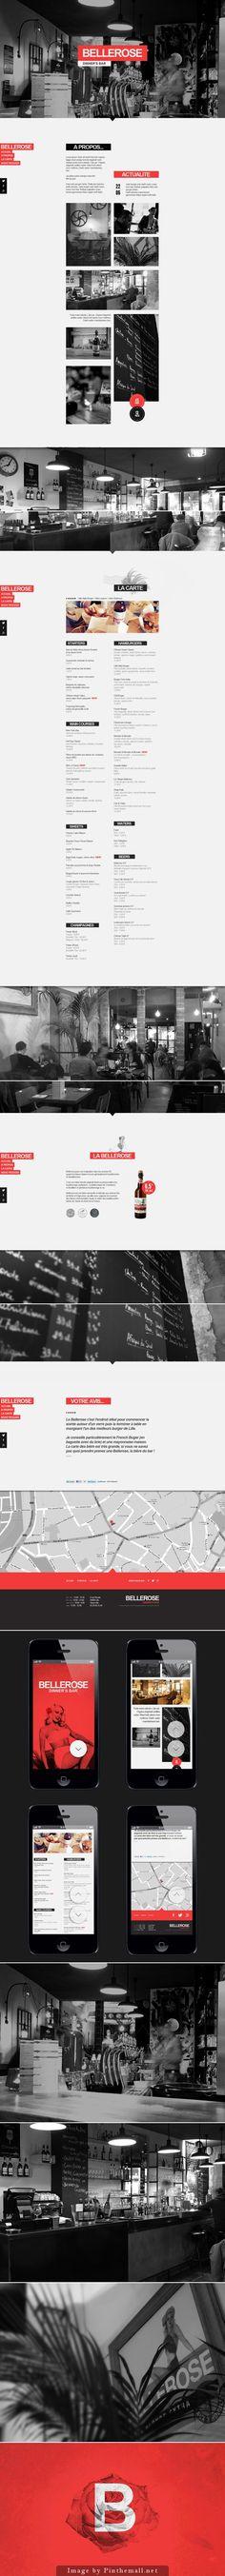 #branding #webdesign #identity